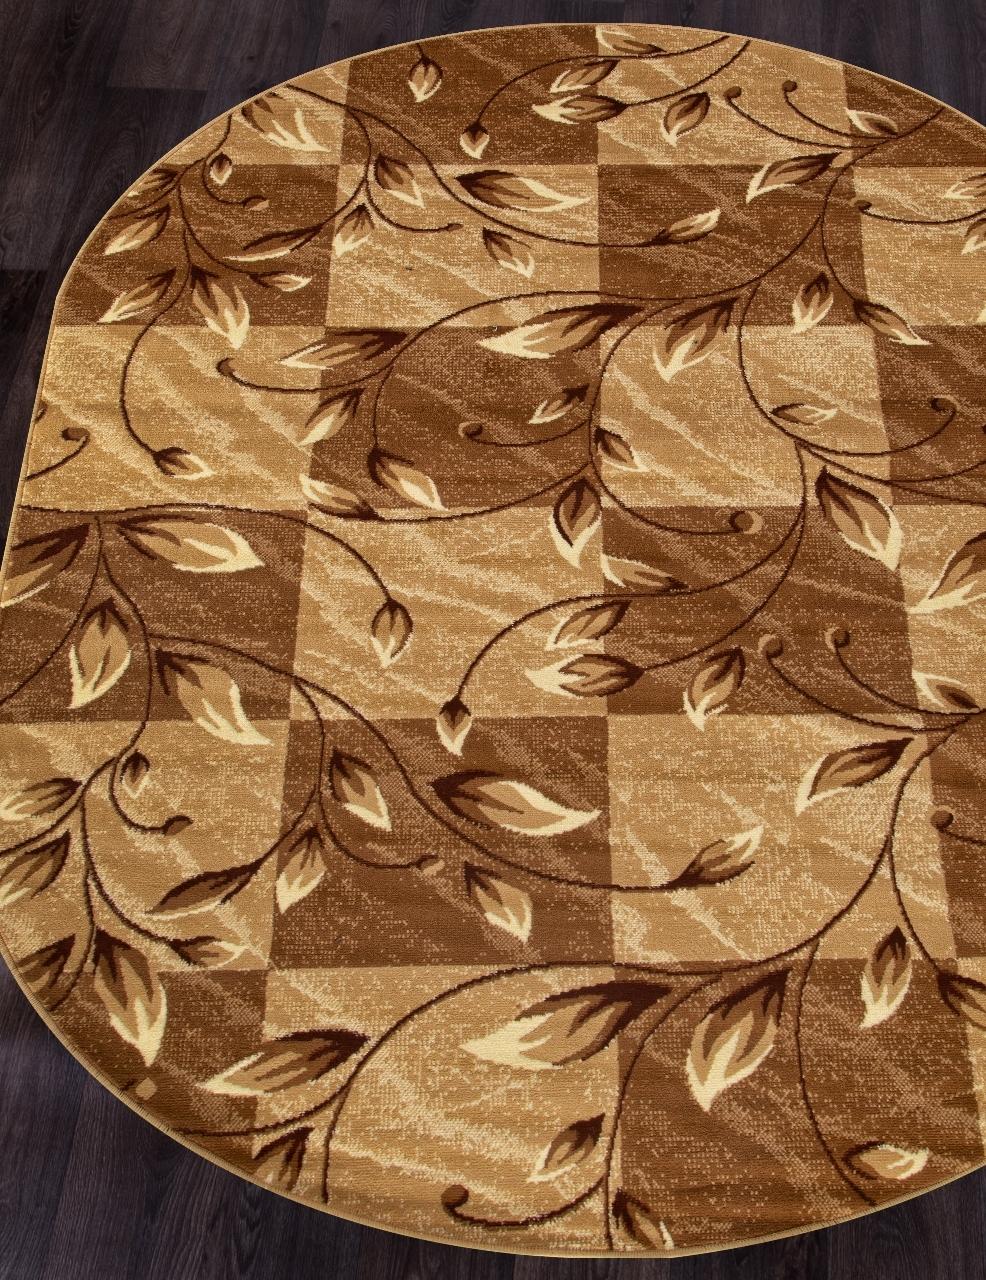 Ковер D480 - BEIGE - Овал - коллекция LAGUNA - фото 1